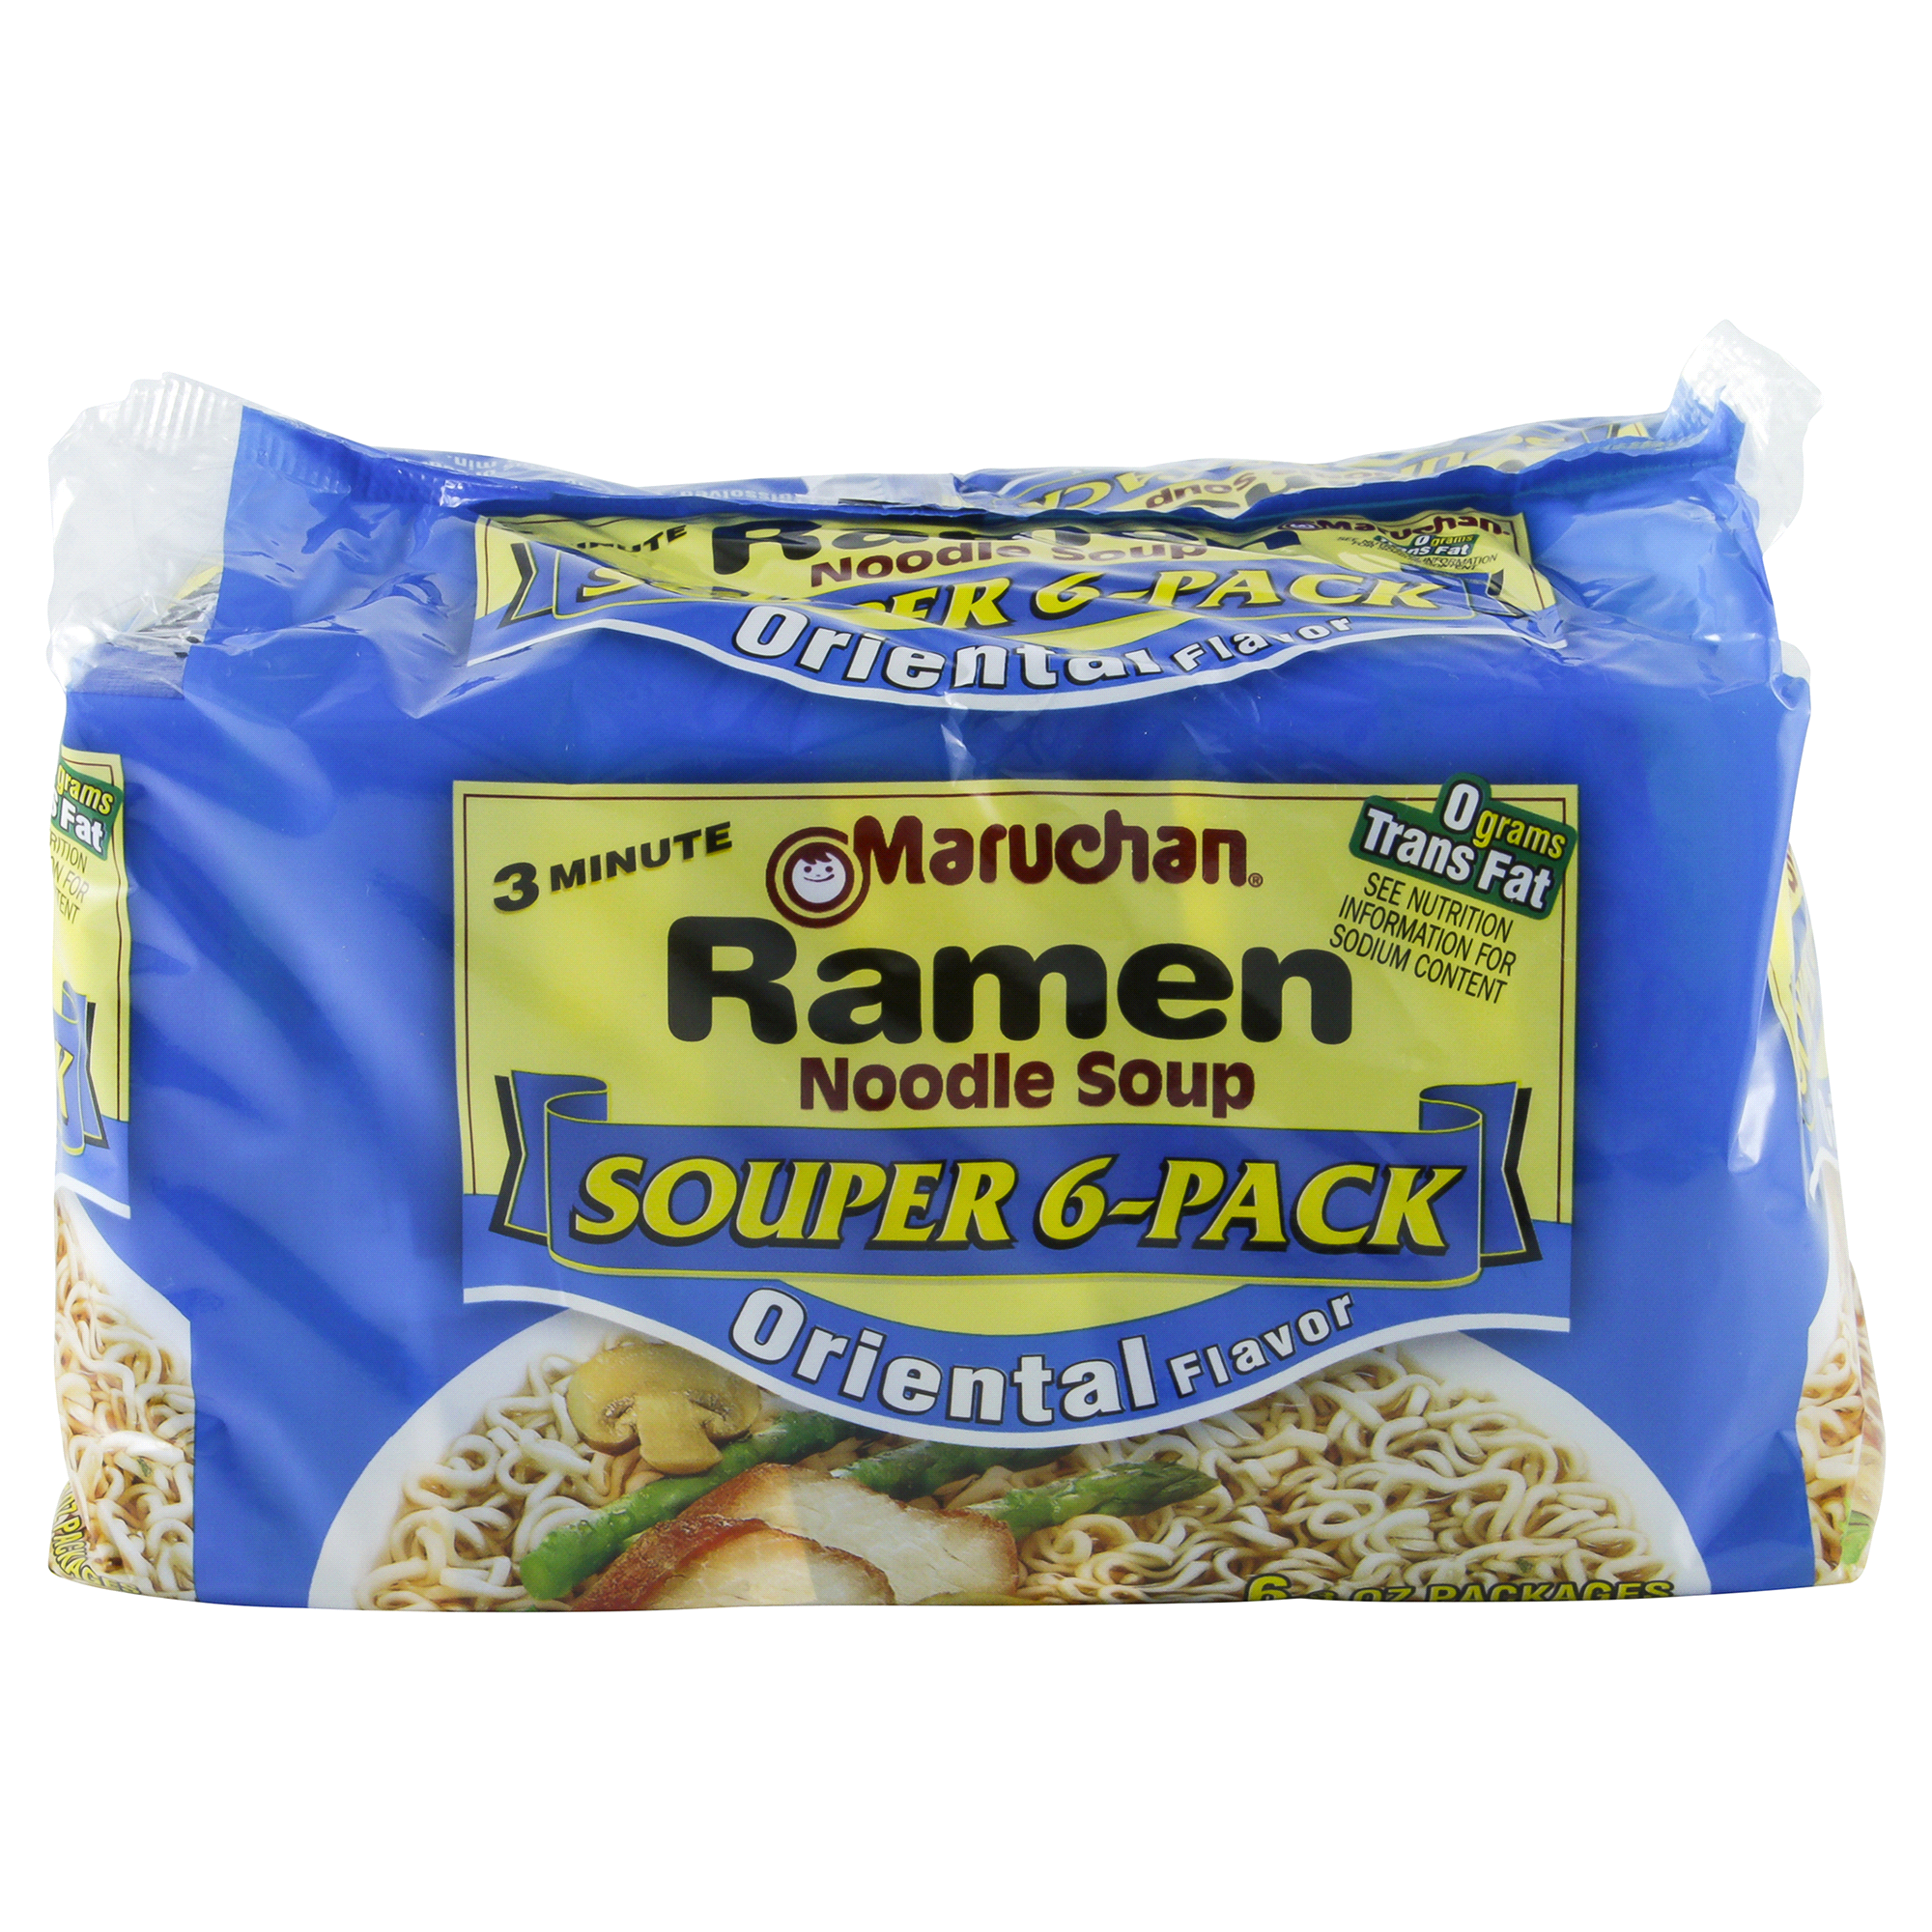 Maruchan Ramen Souper Oriental Pillow Pack - 6/18 oz | Meijer.com on capri sun nutritional information, peanut m & m's nutritional information, coca-cola nutritional information,